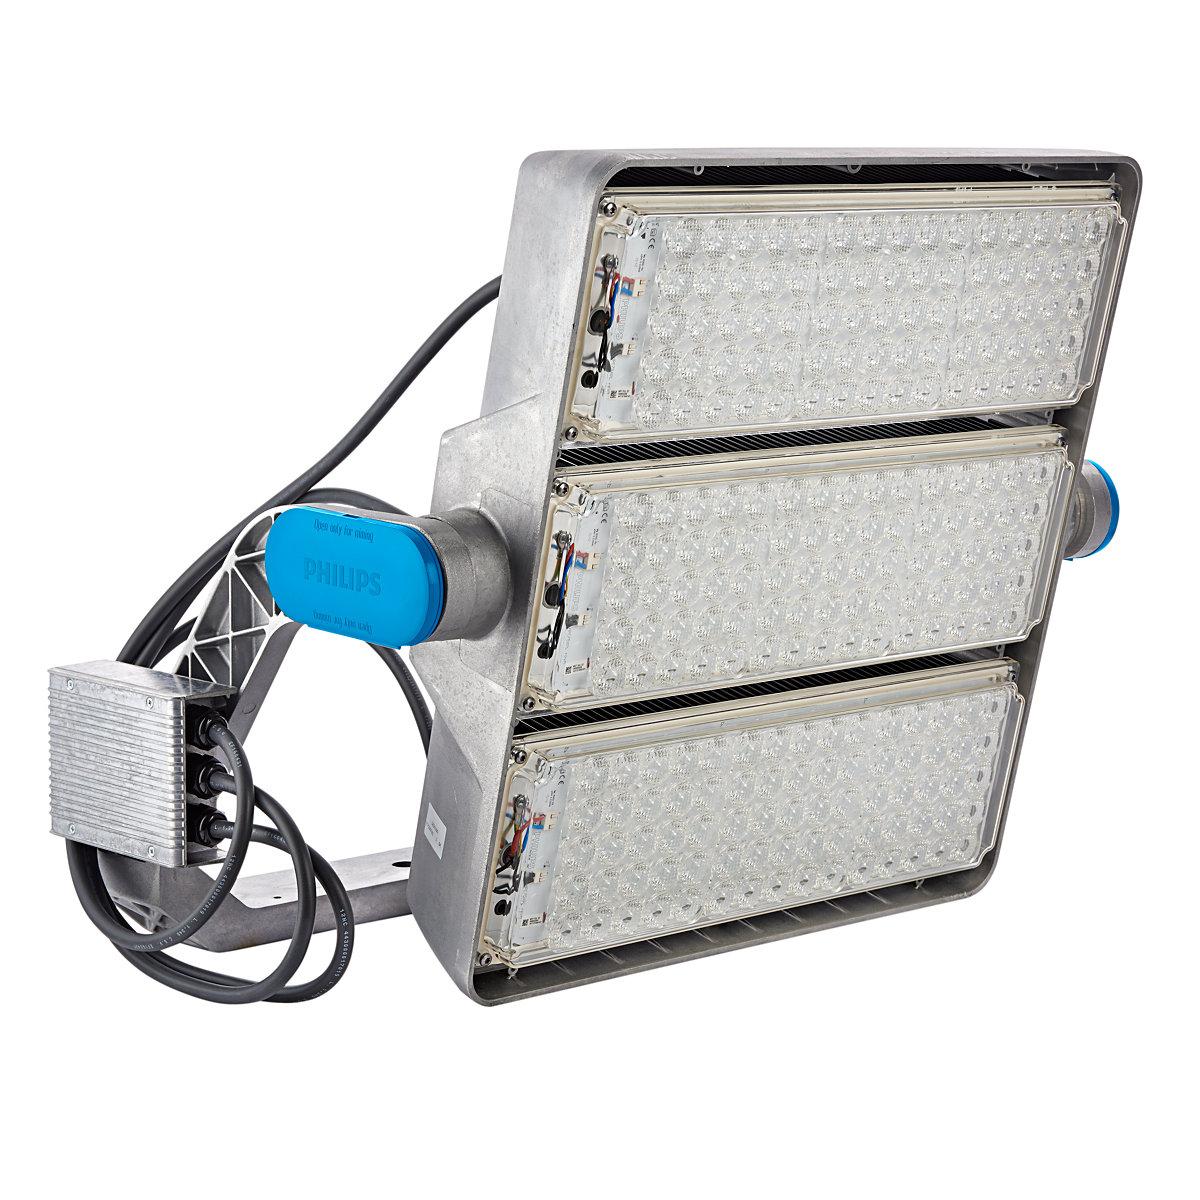 BVP425 1780/857 PSDMX 230V BV S2 T25 ArenaVision LED gen2 ...